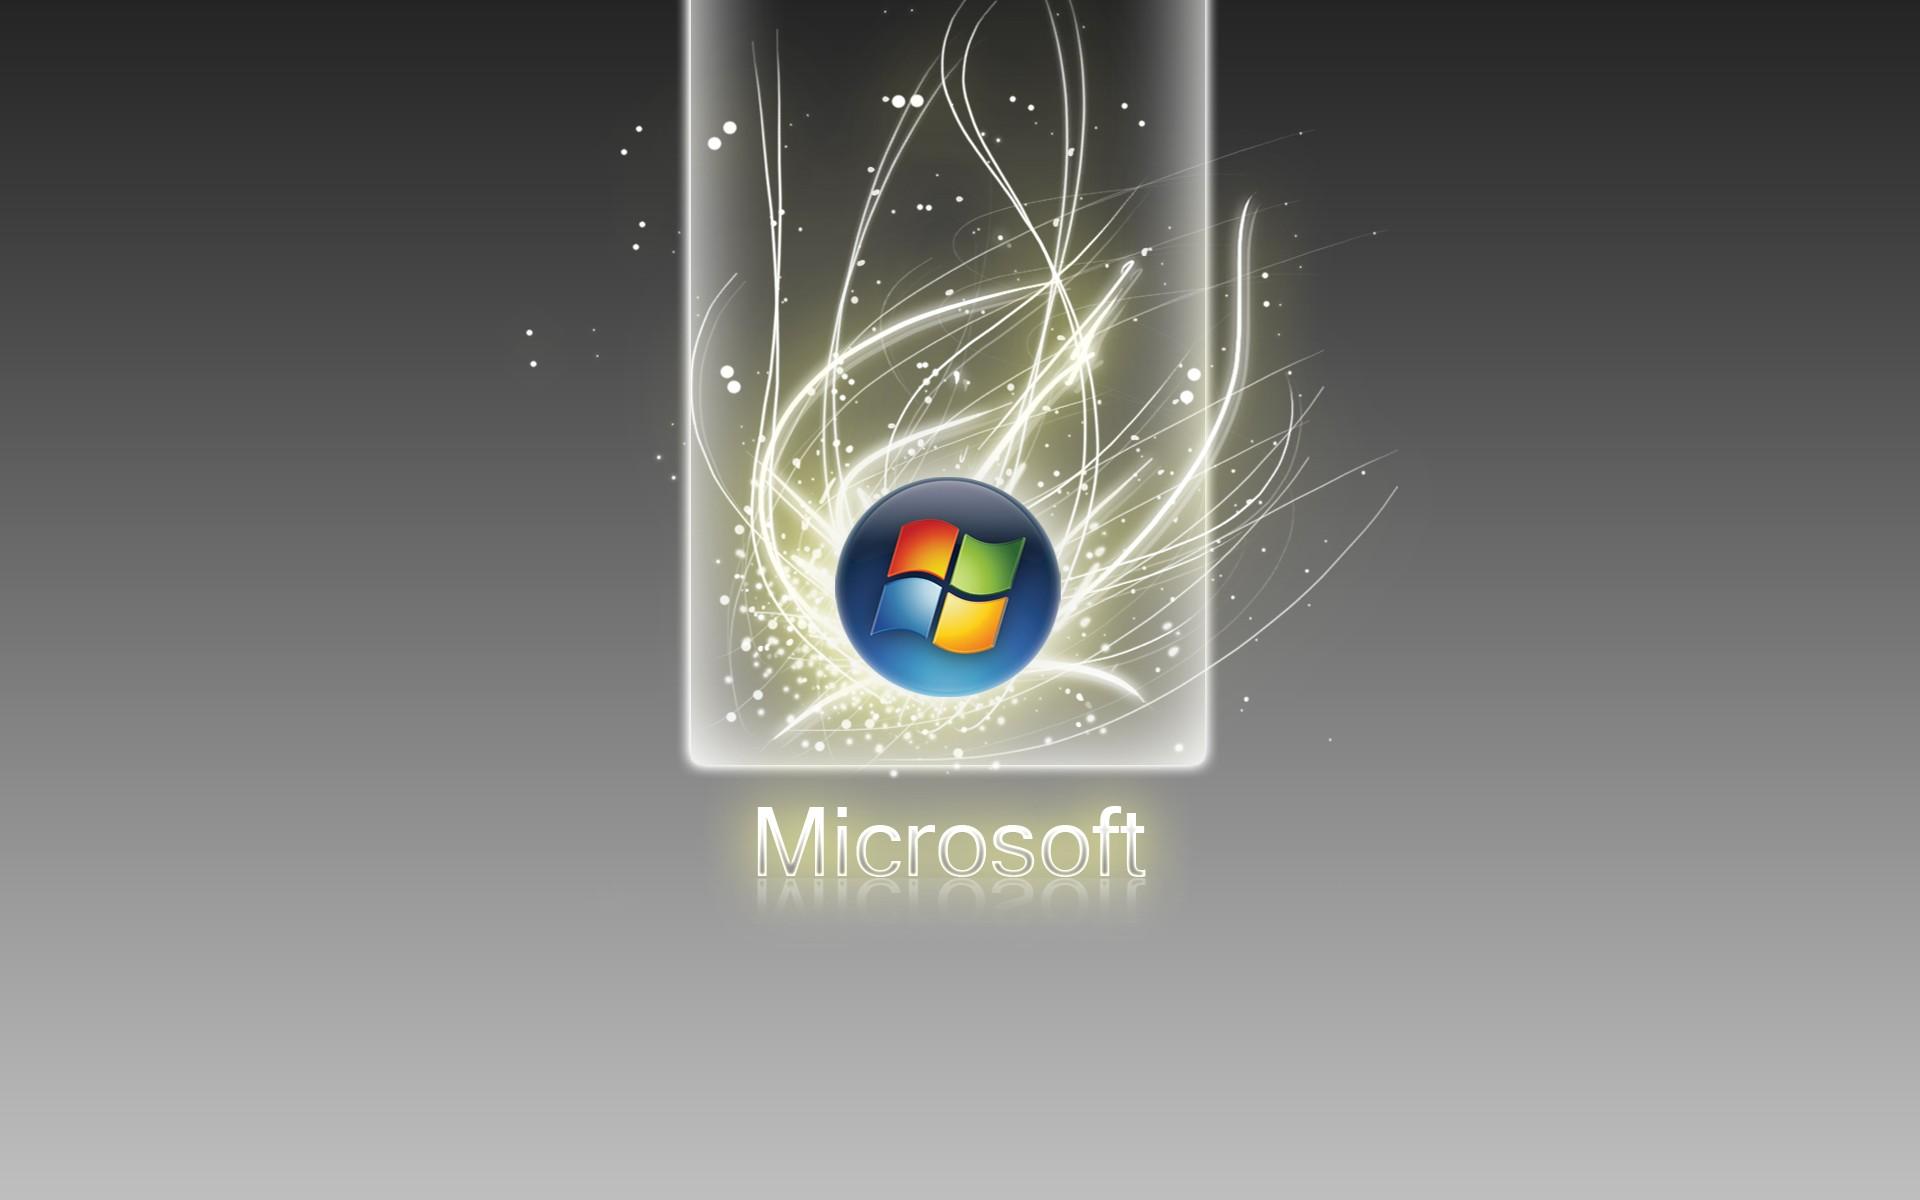 Black Wallpaper For Iphone 7 Microsoft Windows 3d Wallpaper Pixelstalk Net